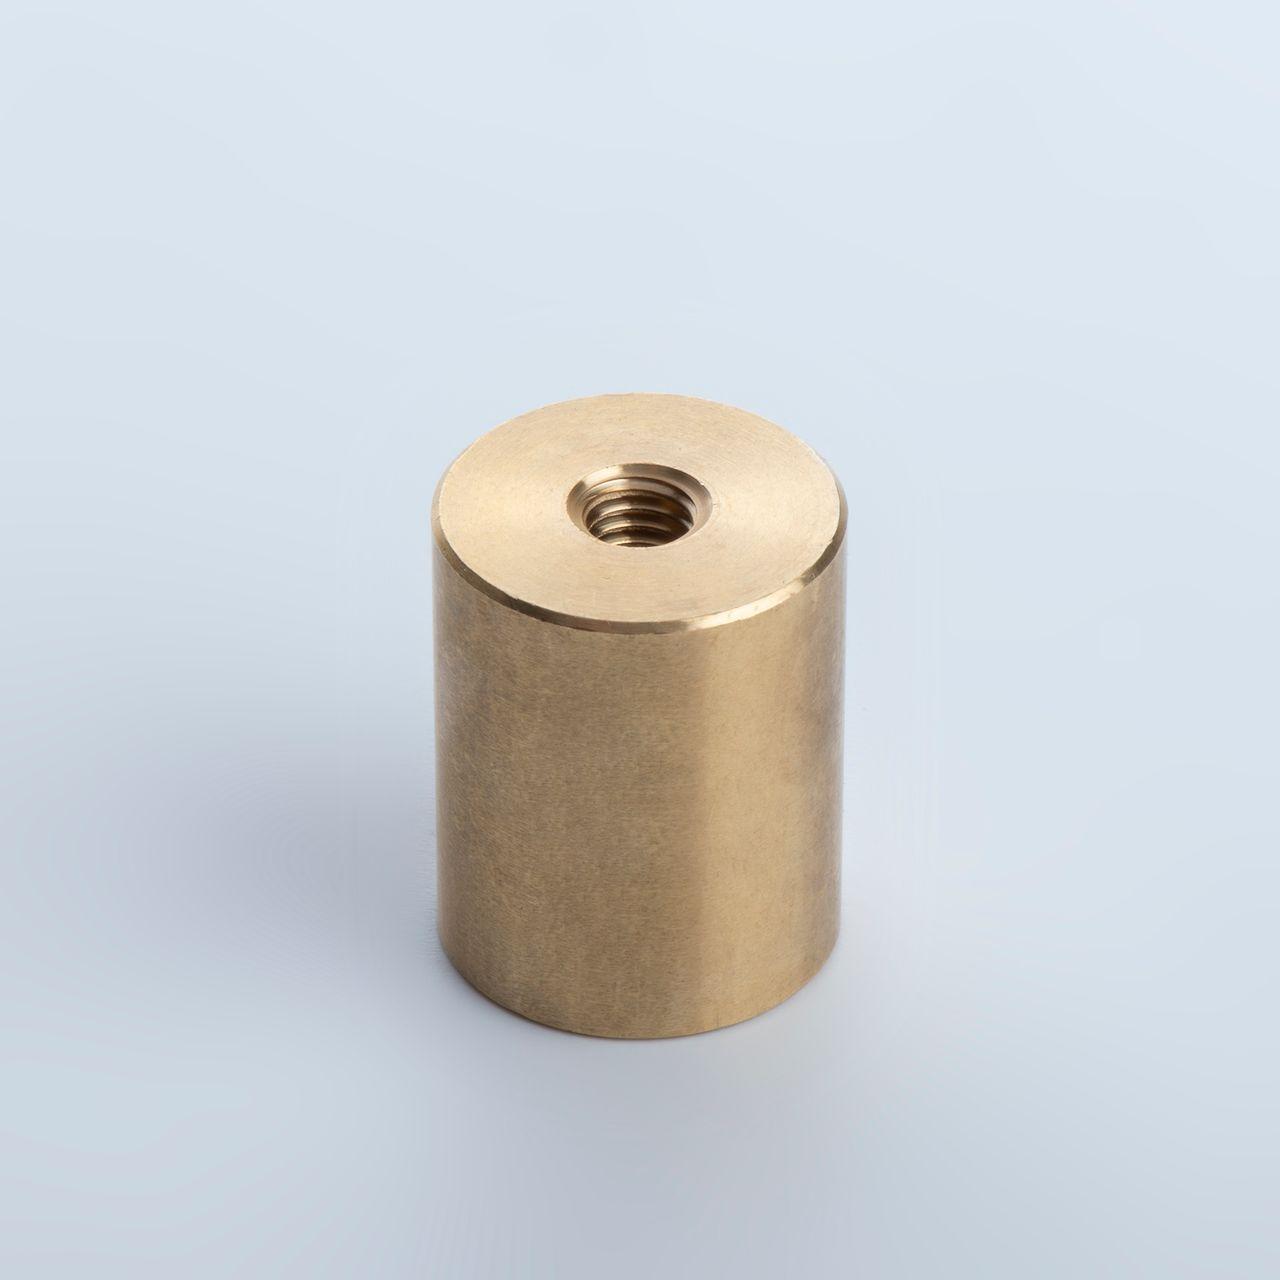 Bar holding magnet made of NdFeB, brass housing with fit tolerance h6 and internal thread, thyssenkrupp Magnettechnik